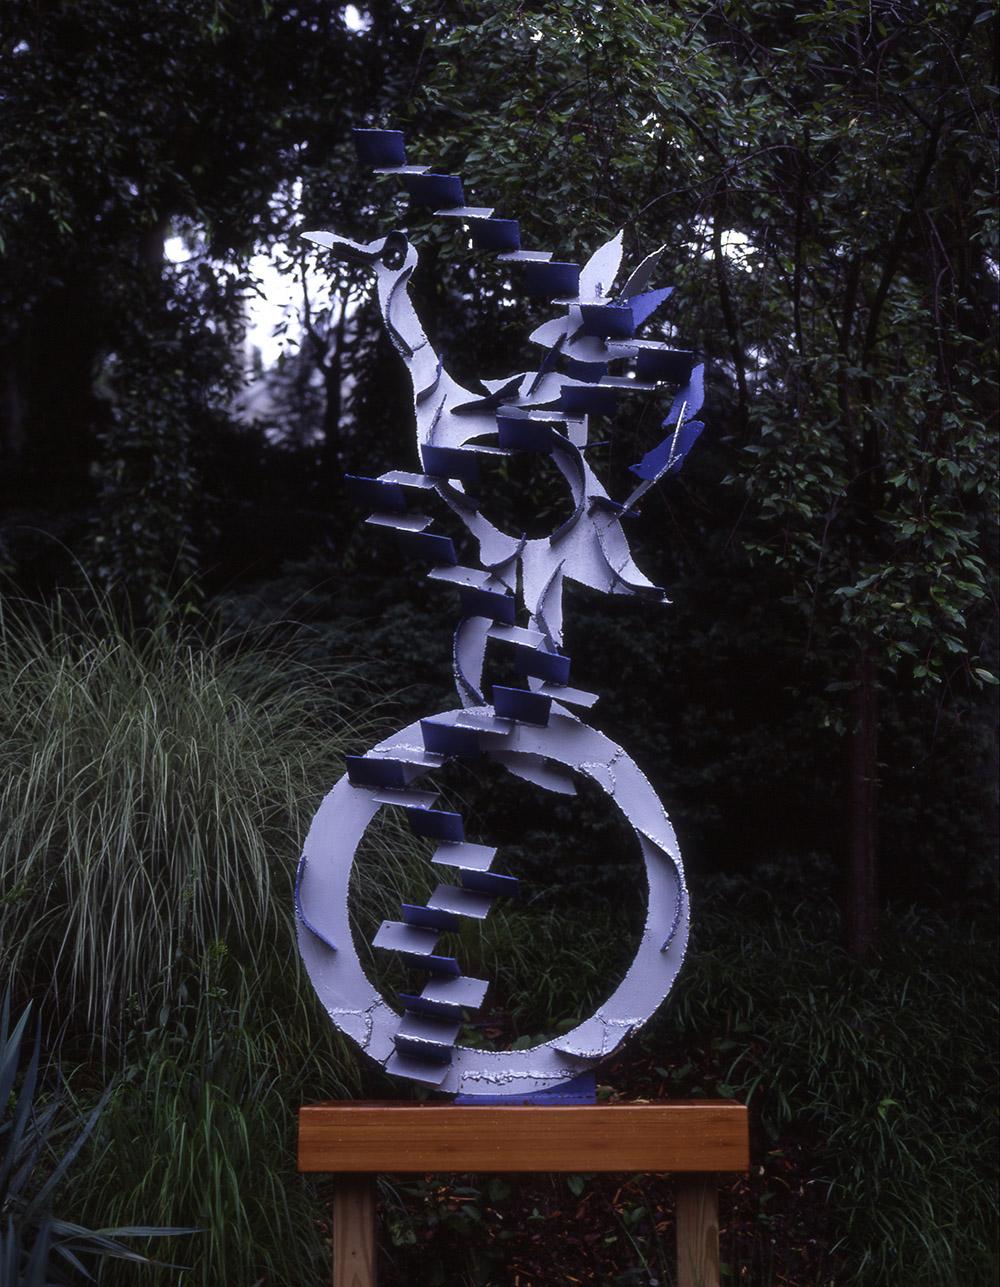 10.b-Ono-Flying-Over-the-Moon-2002.-Steel-213.4-x-76.2-x-15.2-cm-x.jpg